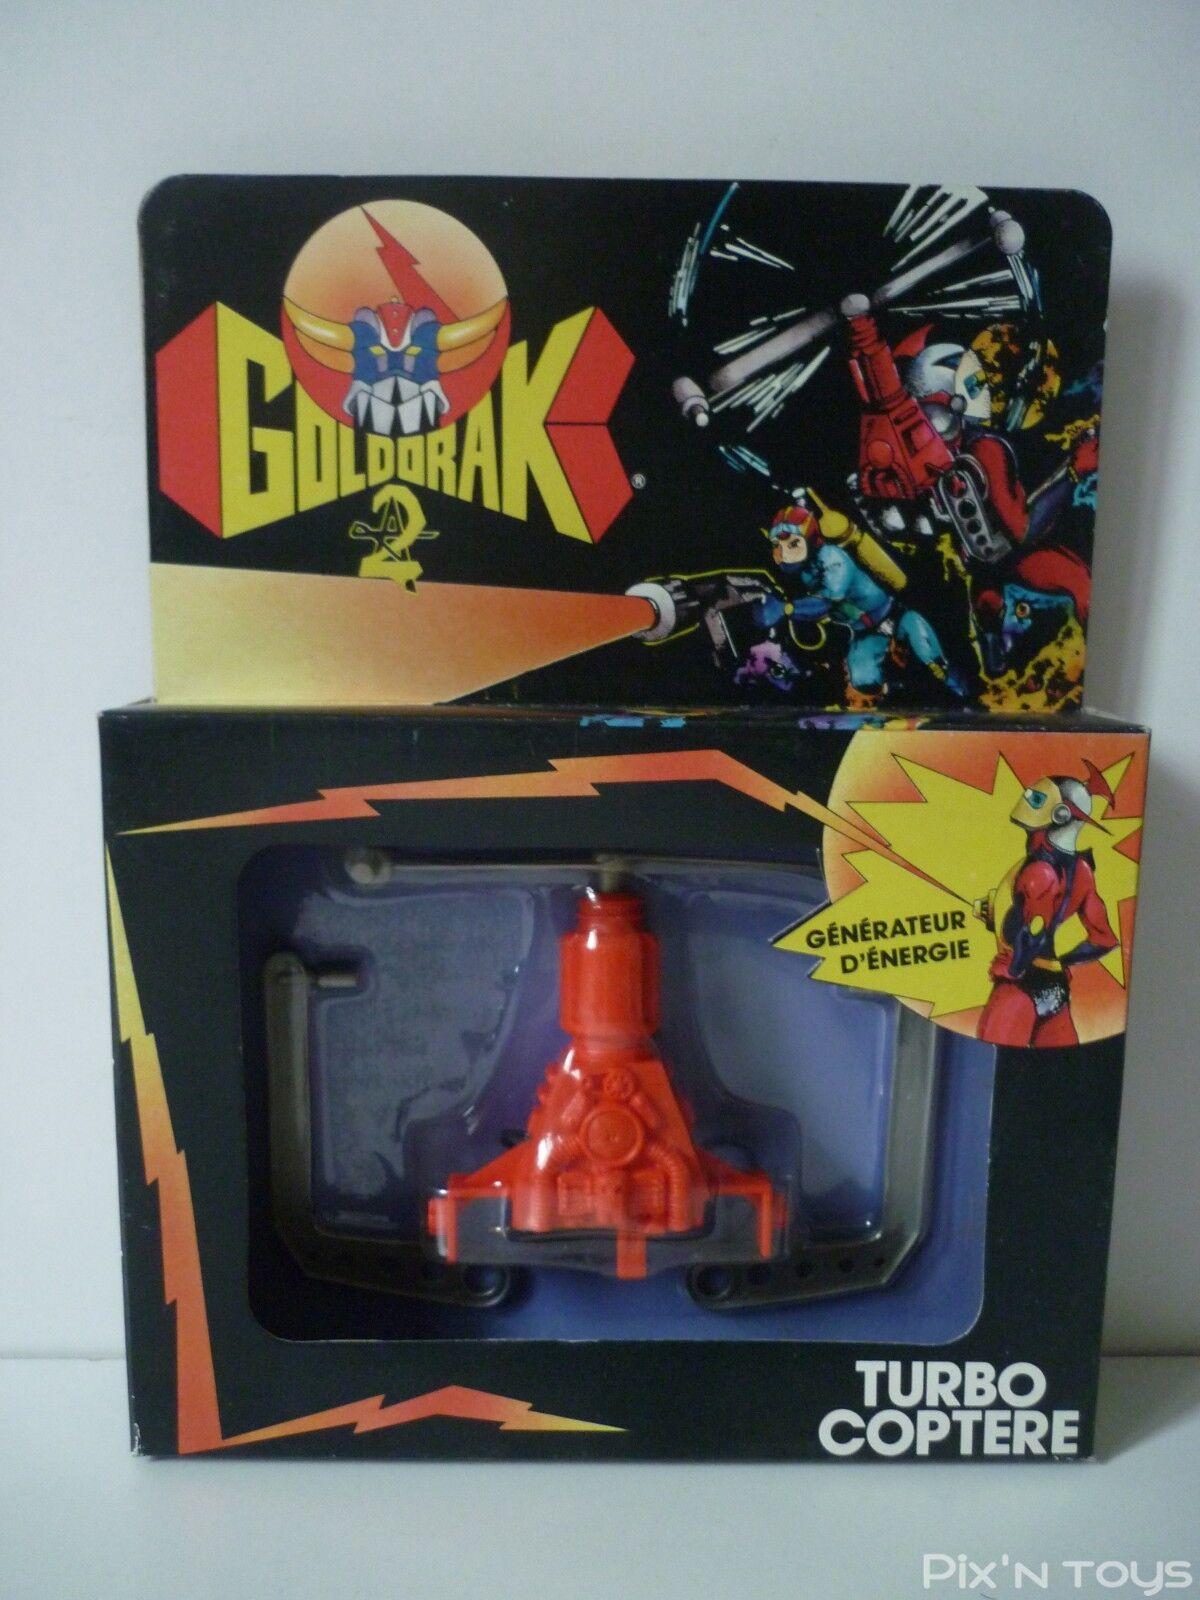 goldORAK   Turbo Coptere Réf. 4003   Ceji 1978 [ Neuf ]